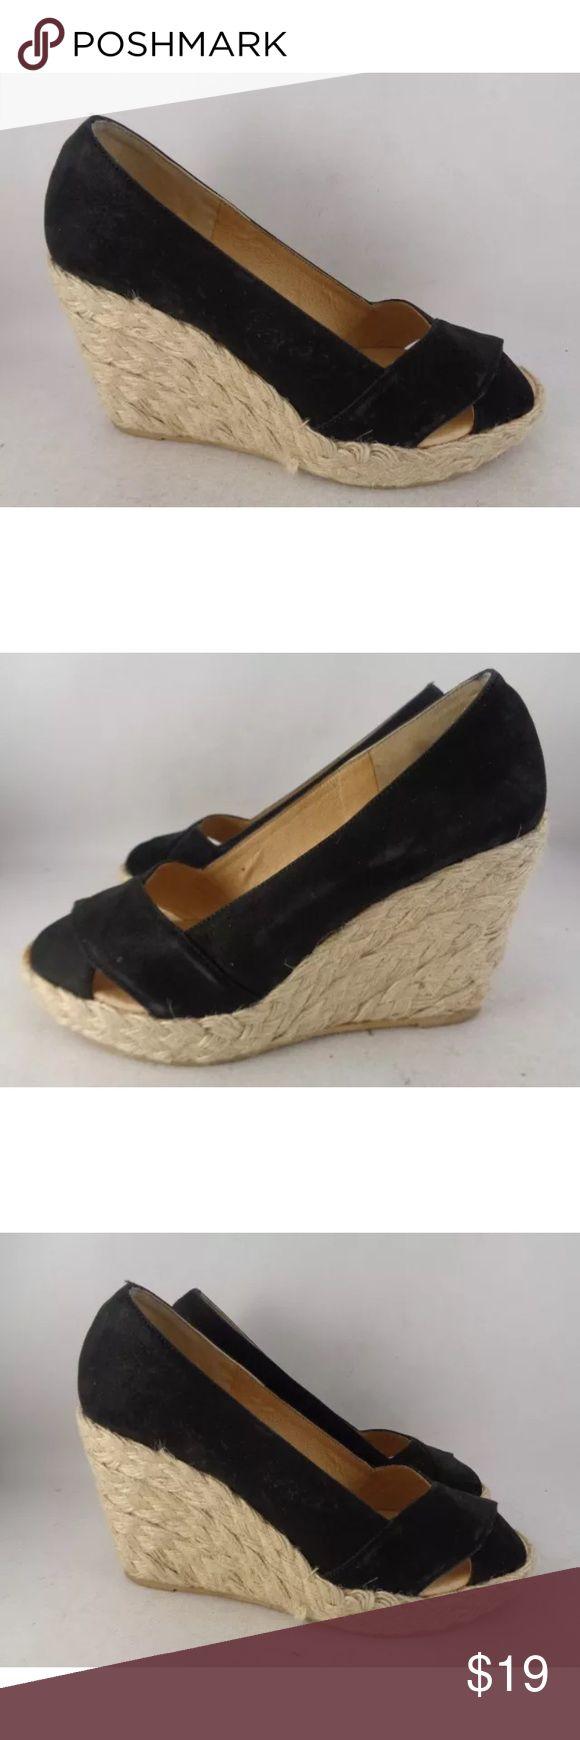 🎉🎉HP 4-14💜💜MICHAEL KORS Sandals Women 5.5M MICHAEL KORS Sandals Women Size 5.5M Platforms Women Heels bed Michael Kors Shoes Wedges